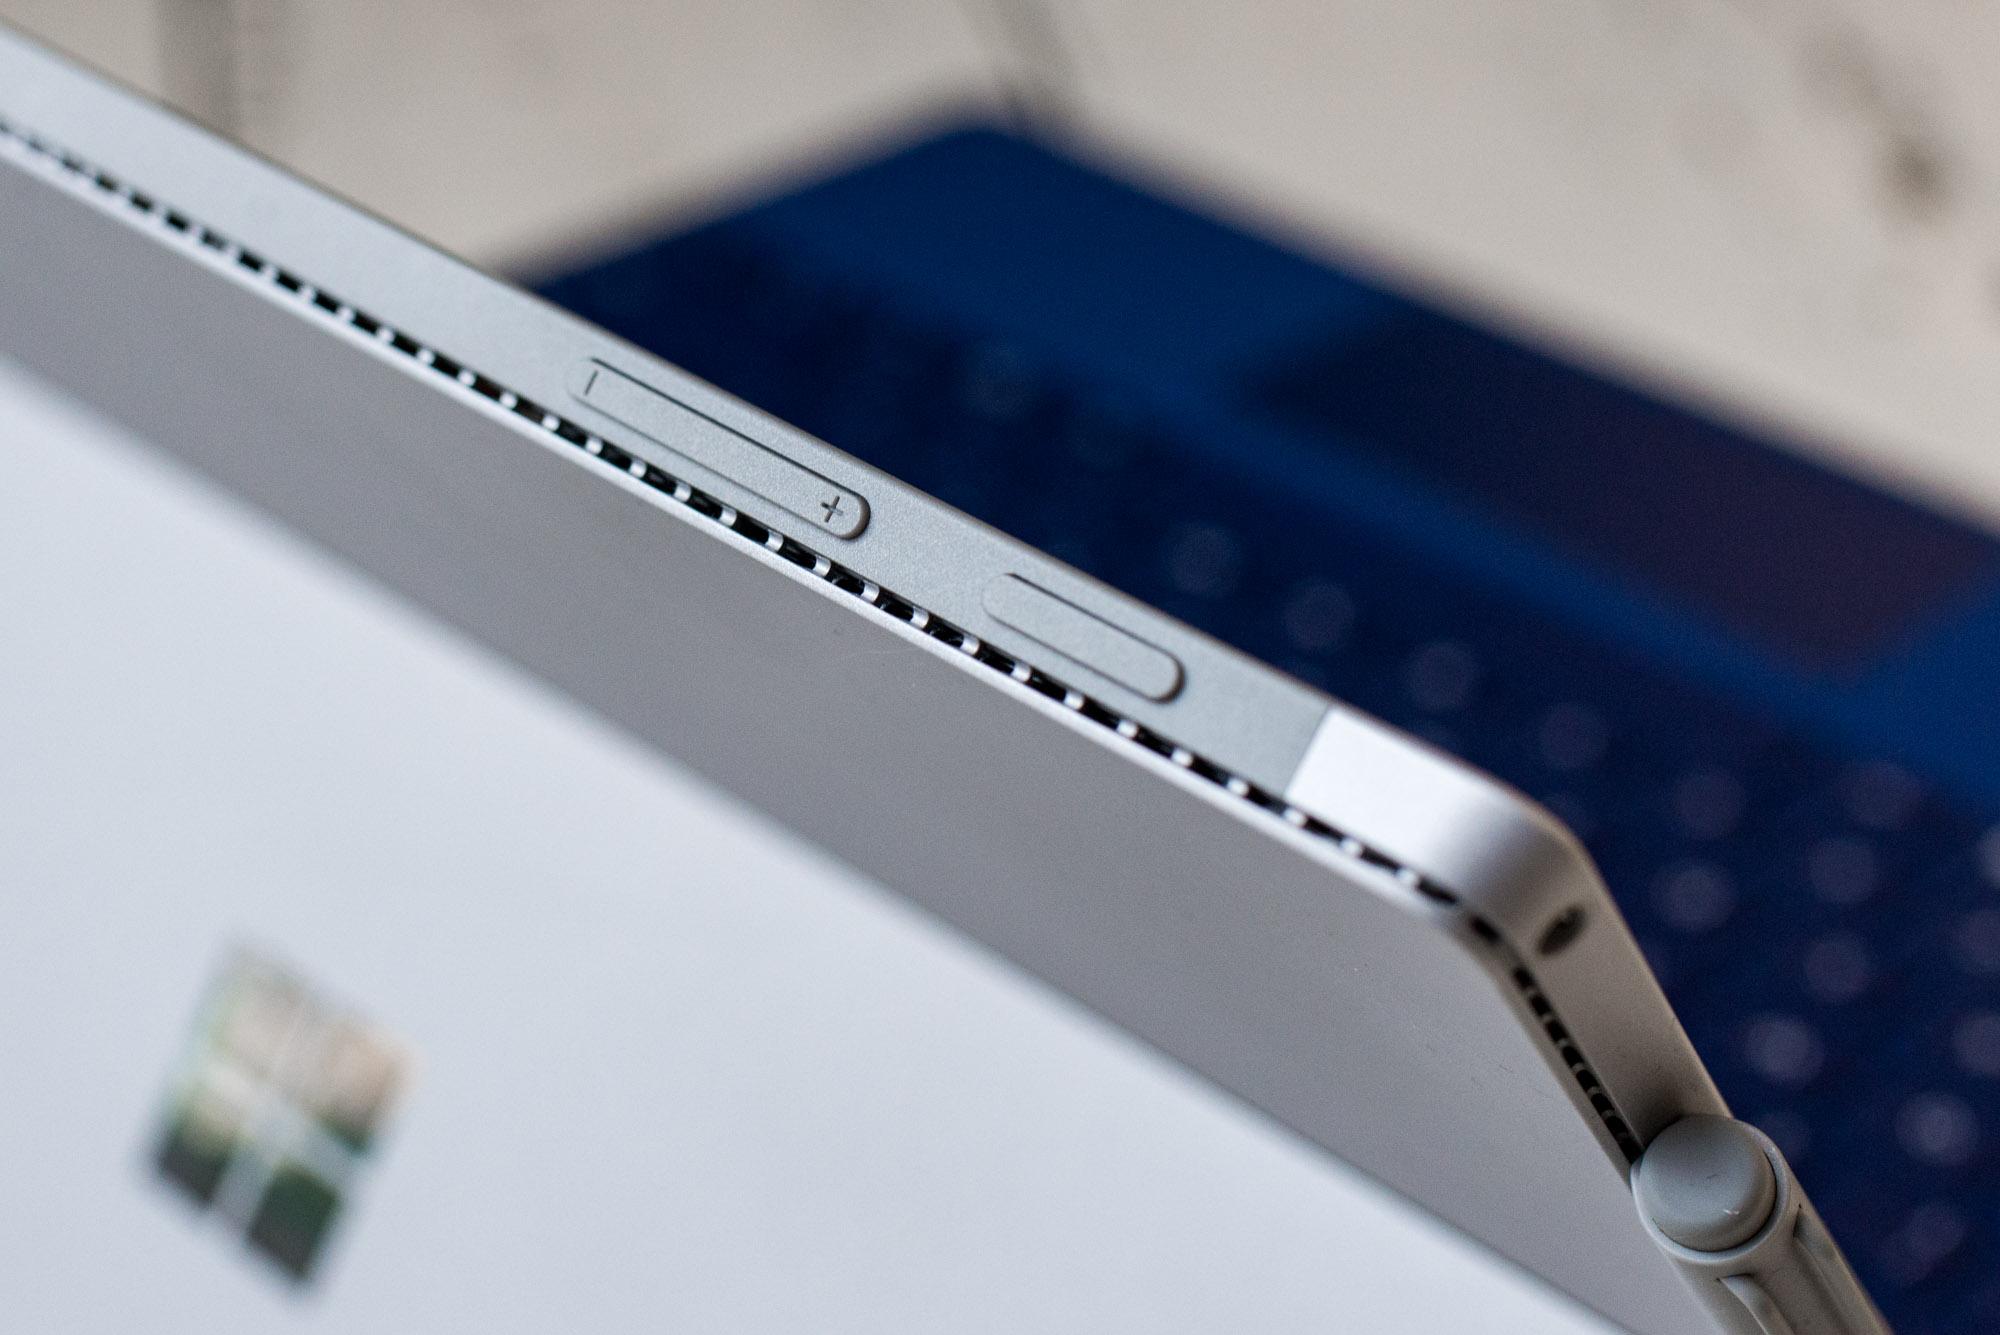 Surface-Pro-4-LK-4